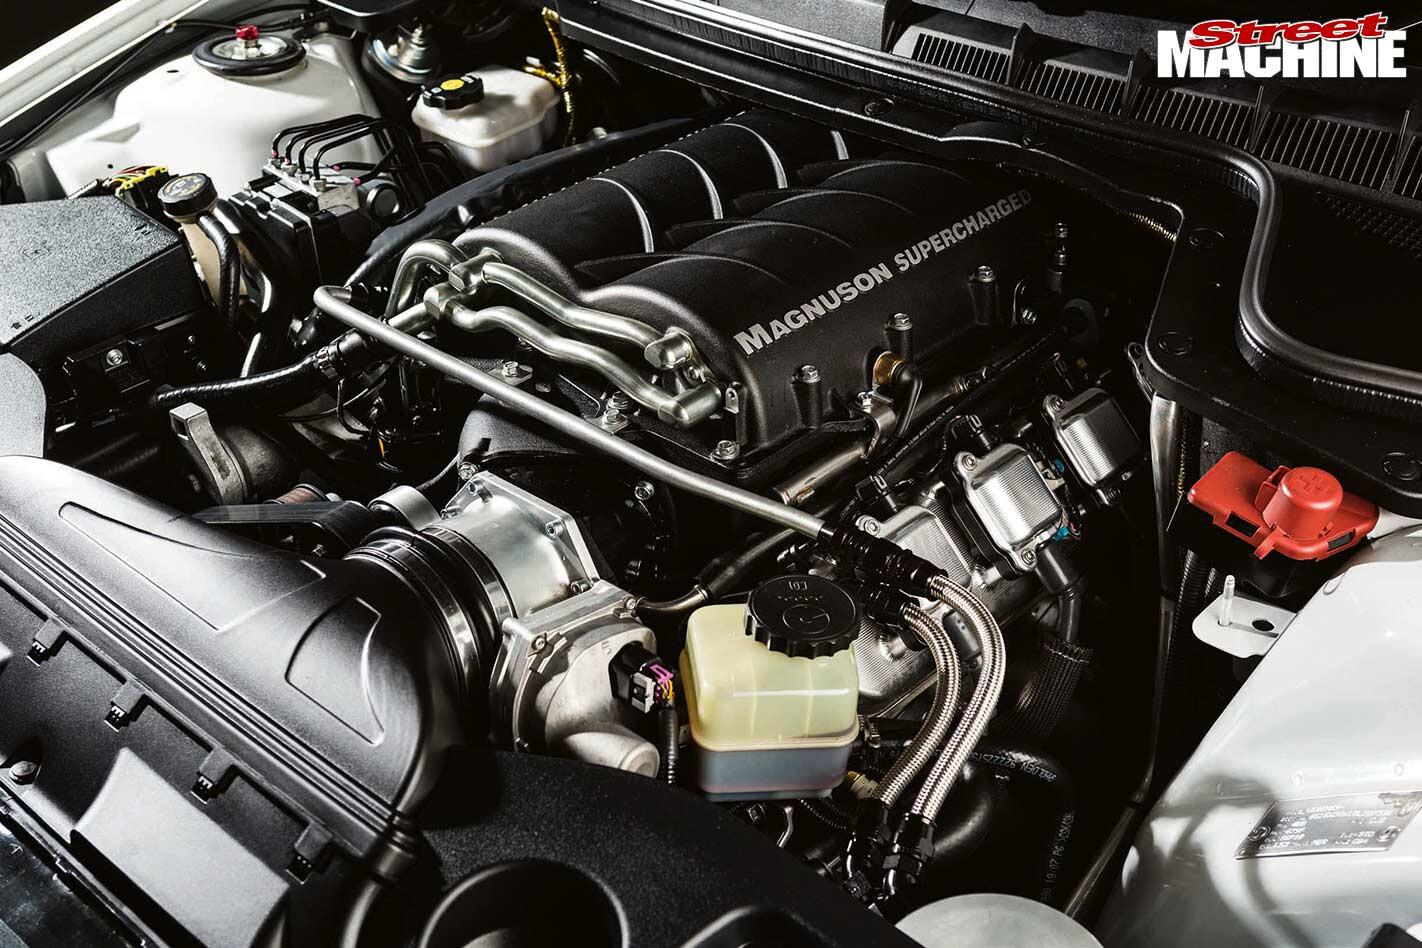 HSV GTS engine